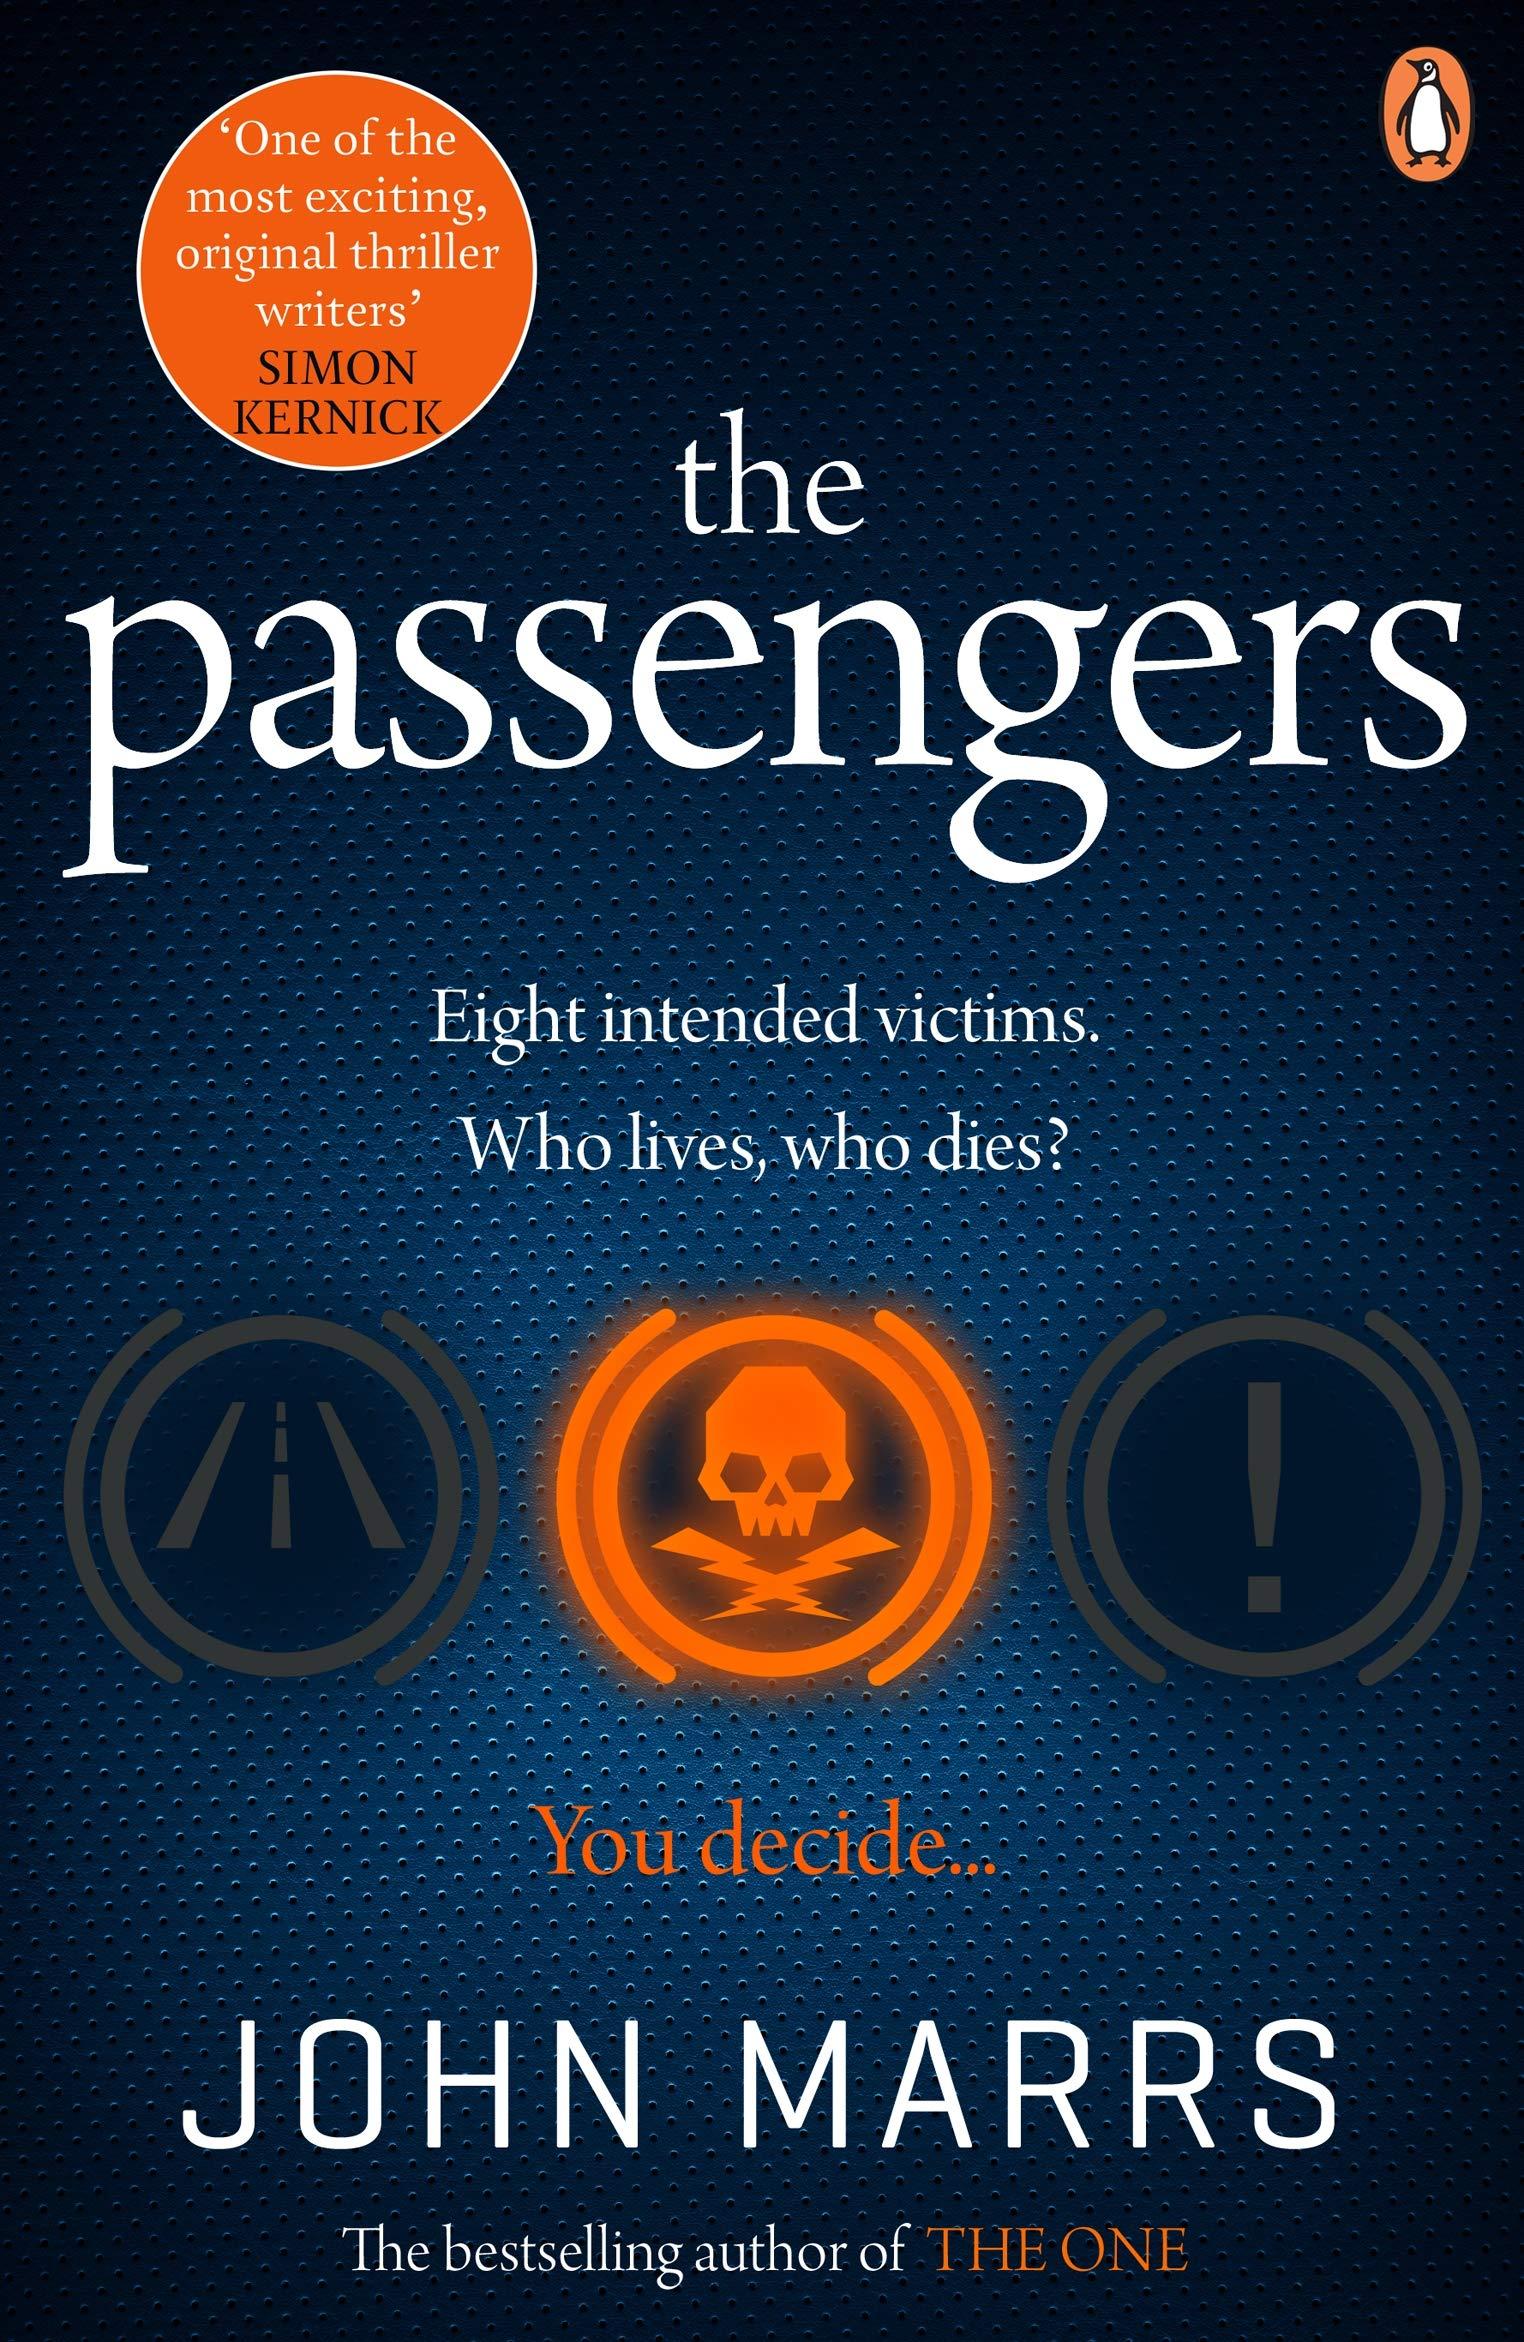 Image result for the passengers john marrs